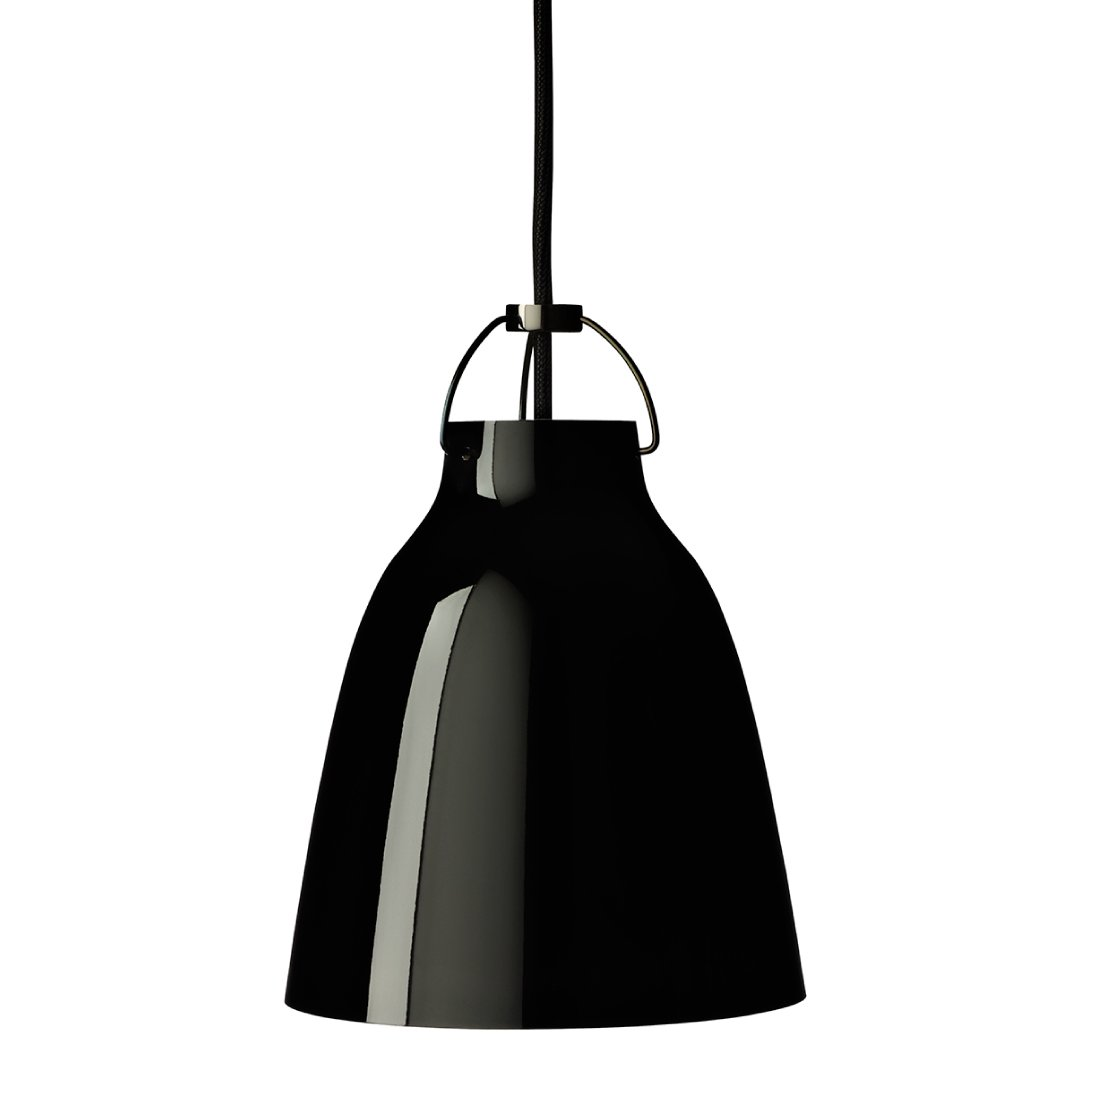 Lightyears Caravaggio P1 Hoogglans Zwart - Zwart